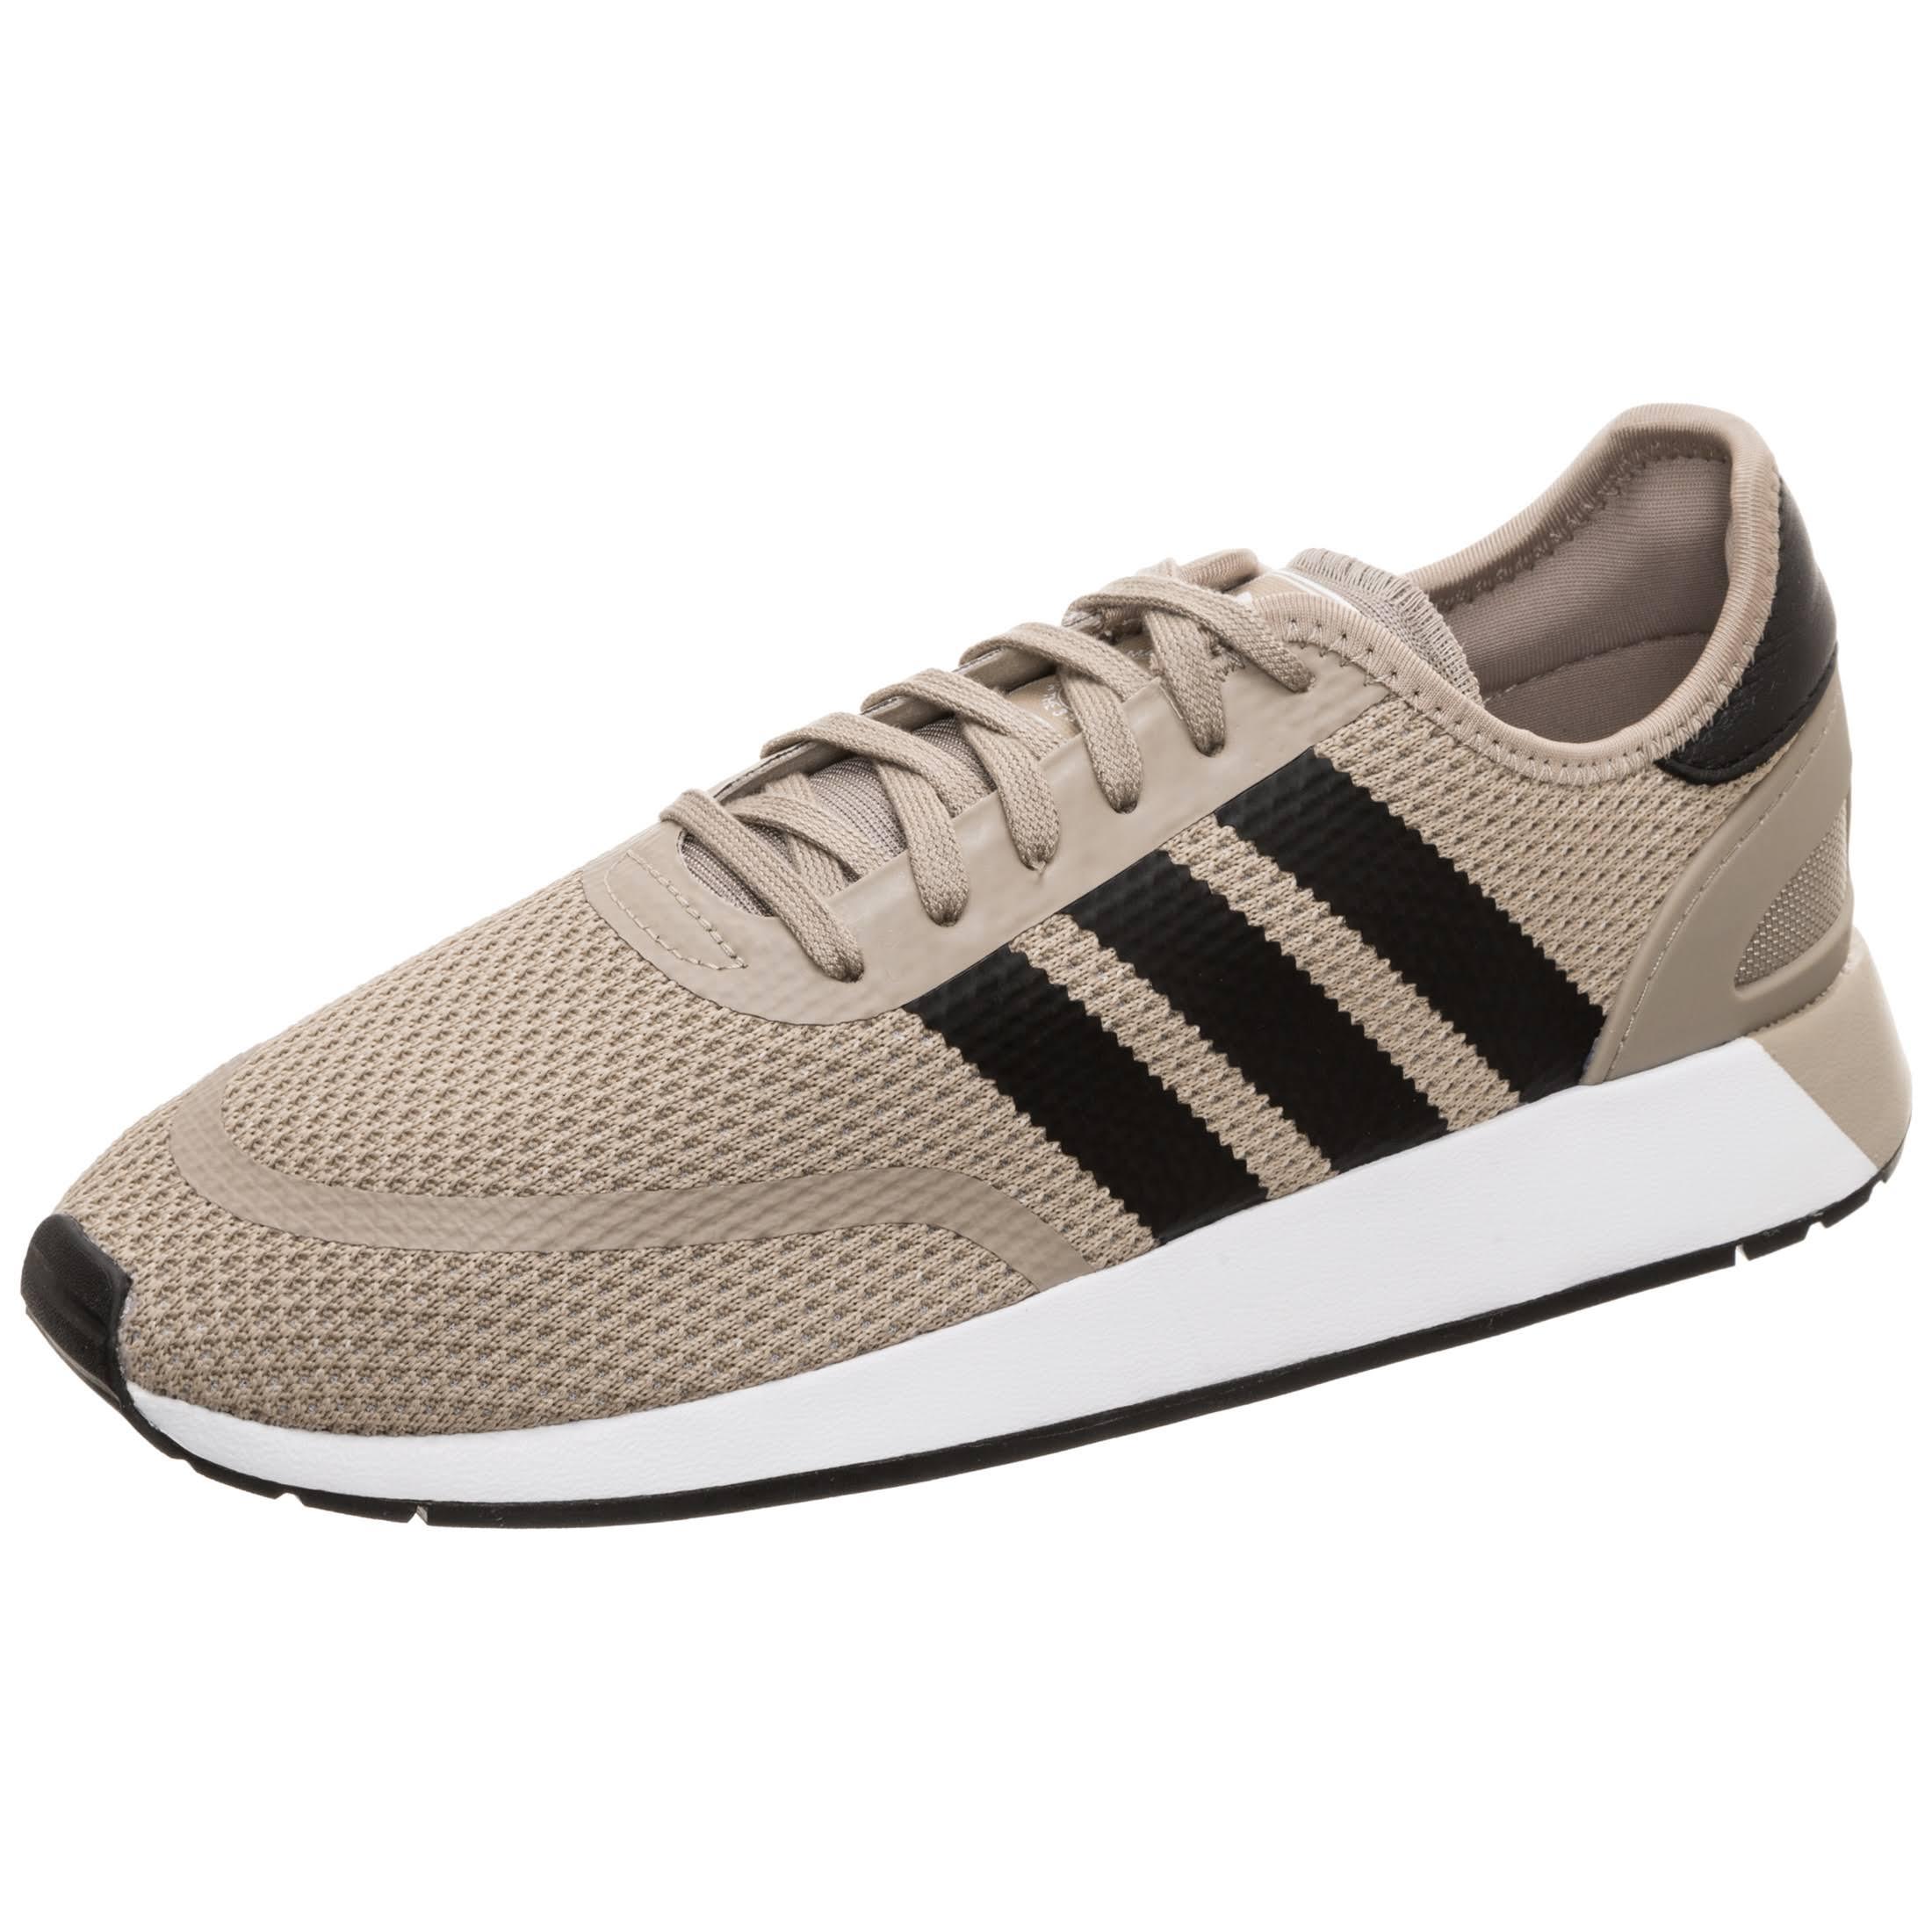 M Tracekhaki 5923 coreblack Sneaker schwarz 43 Grün Originals Hellbraun ftwrwhite N Adidas tqxwzfng